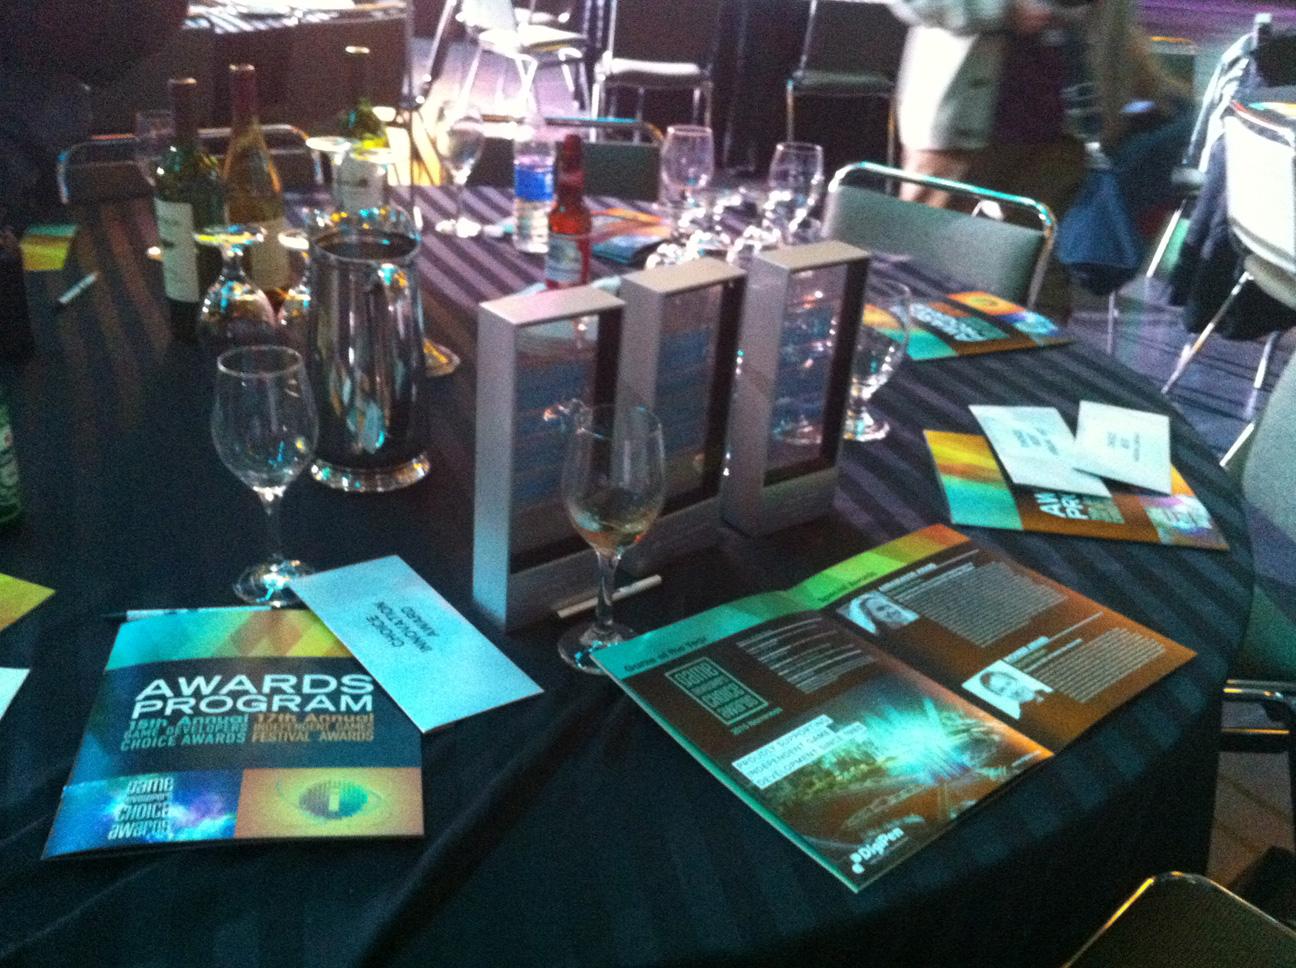 Three GDC Awards. Unbelievable.